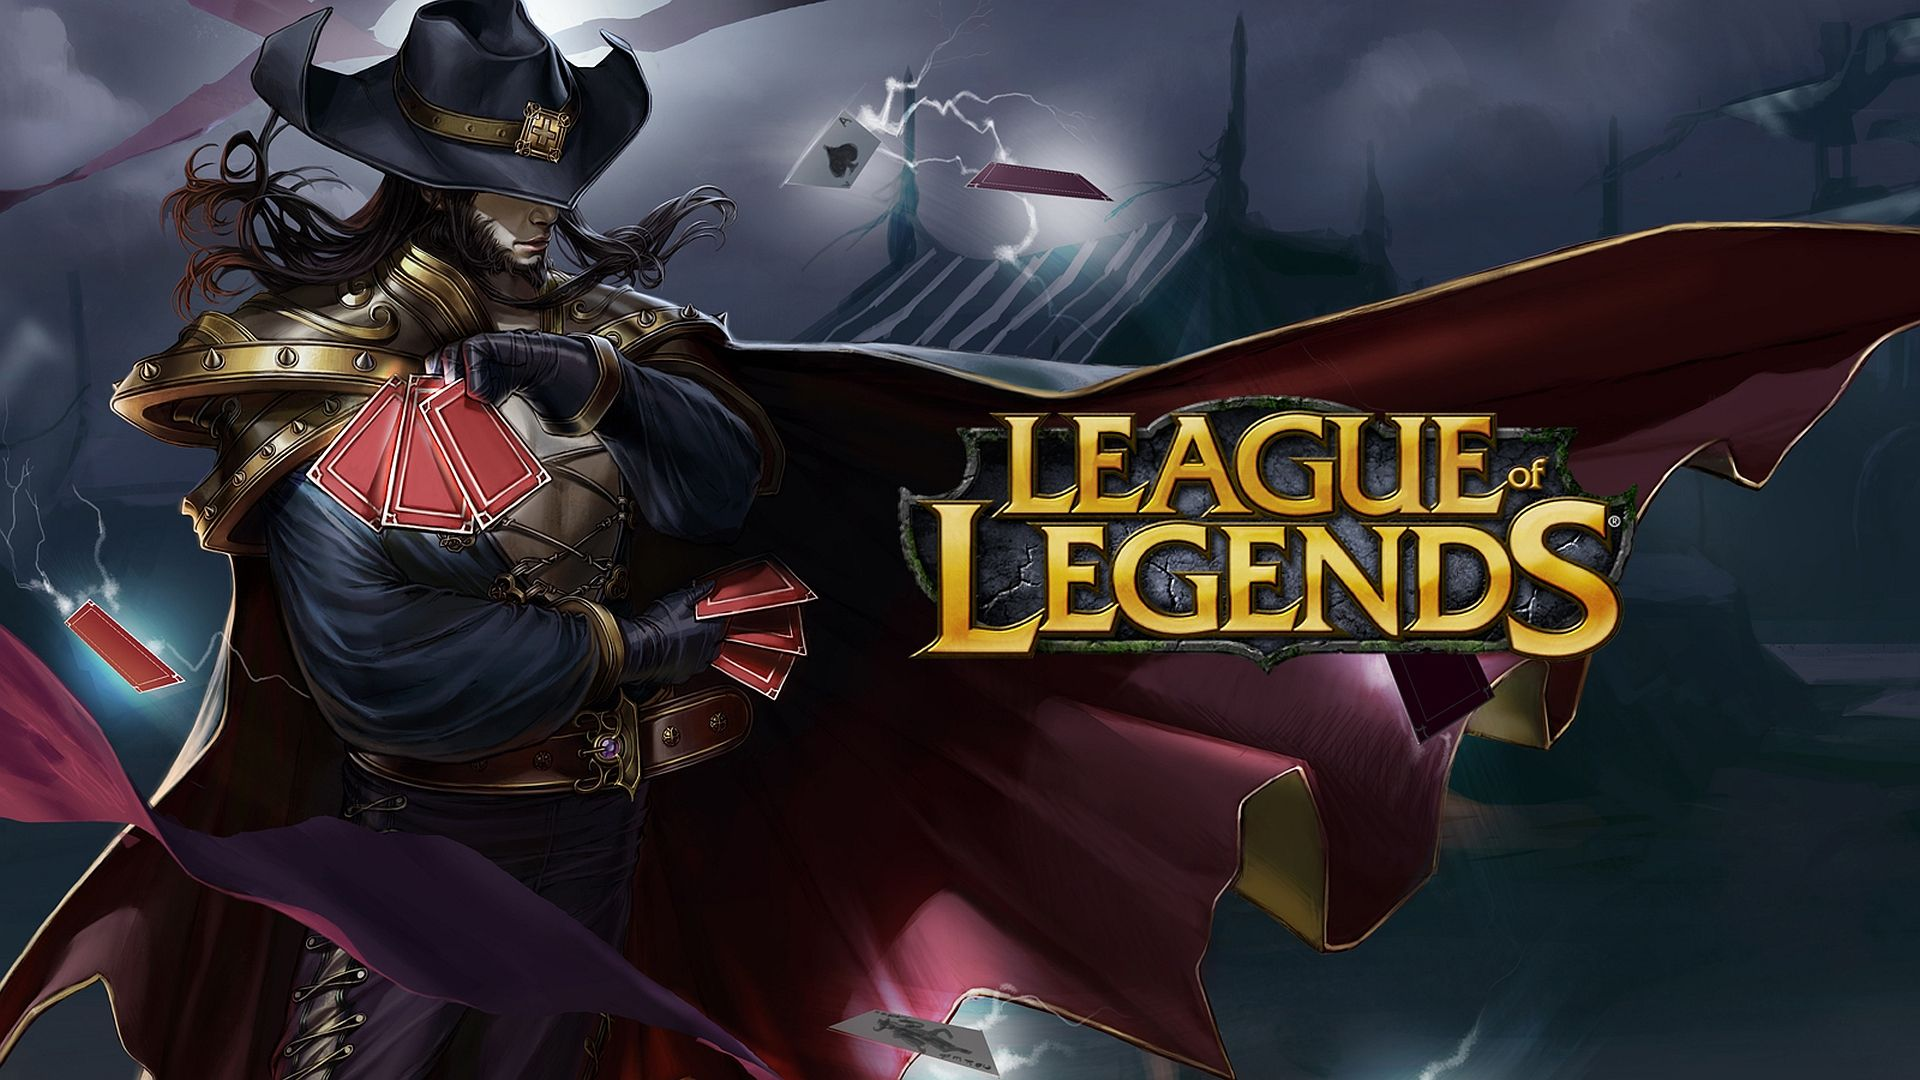 League of Legends wallpaper 137